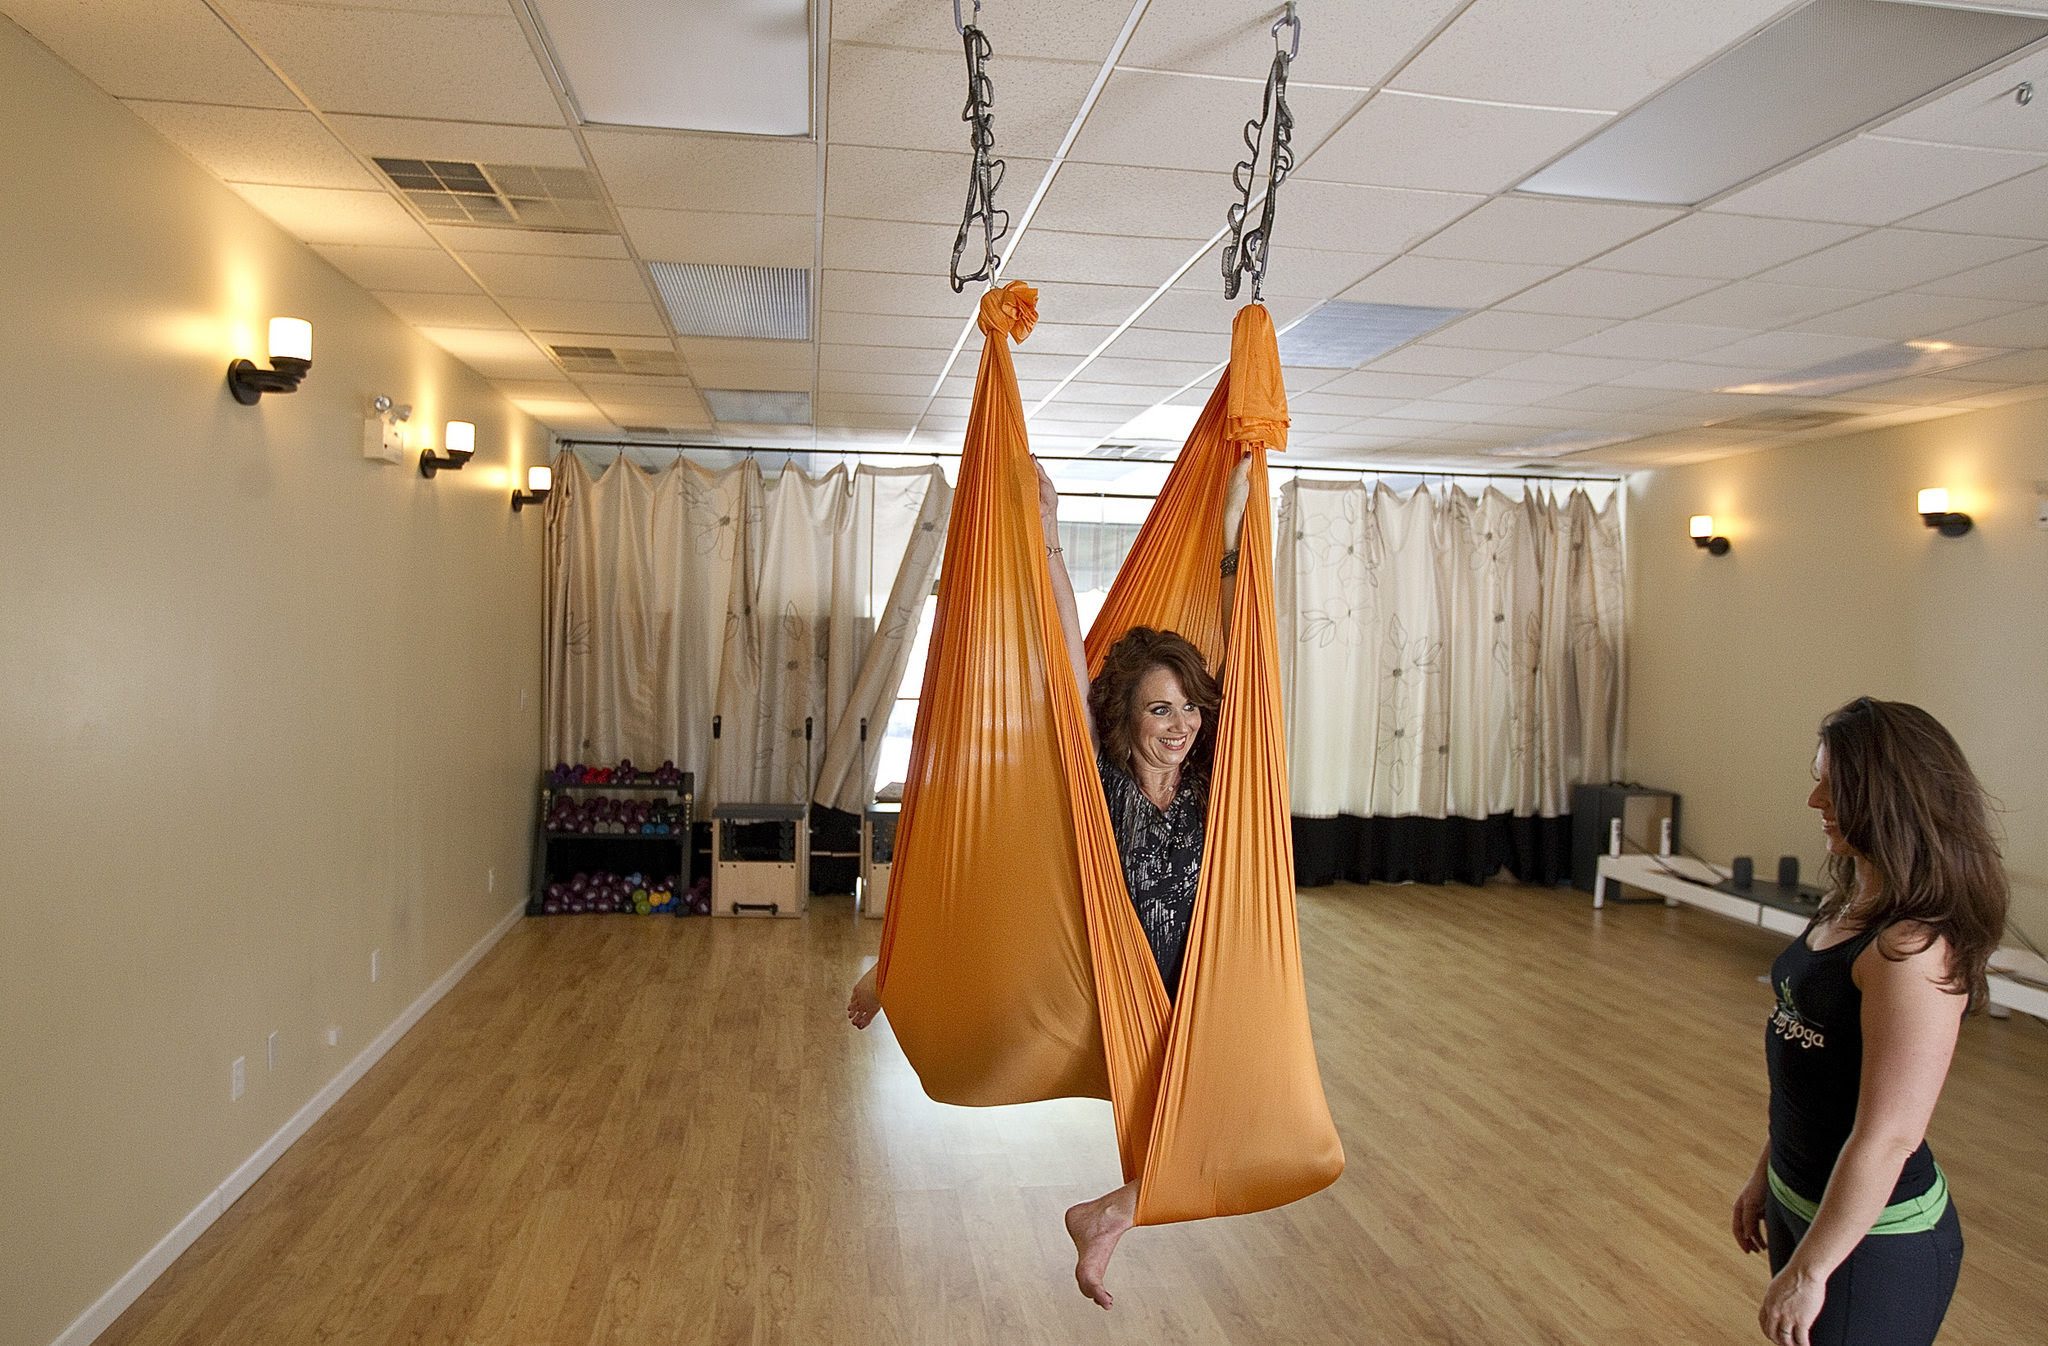 Aerial Yoga Classes Near Me - Yoga For You